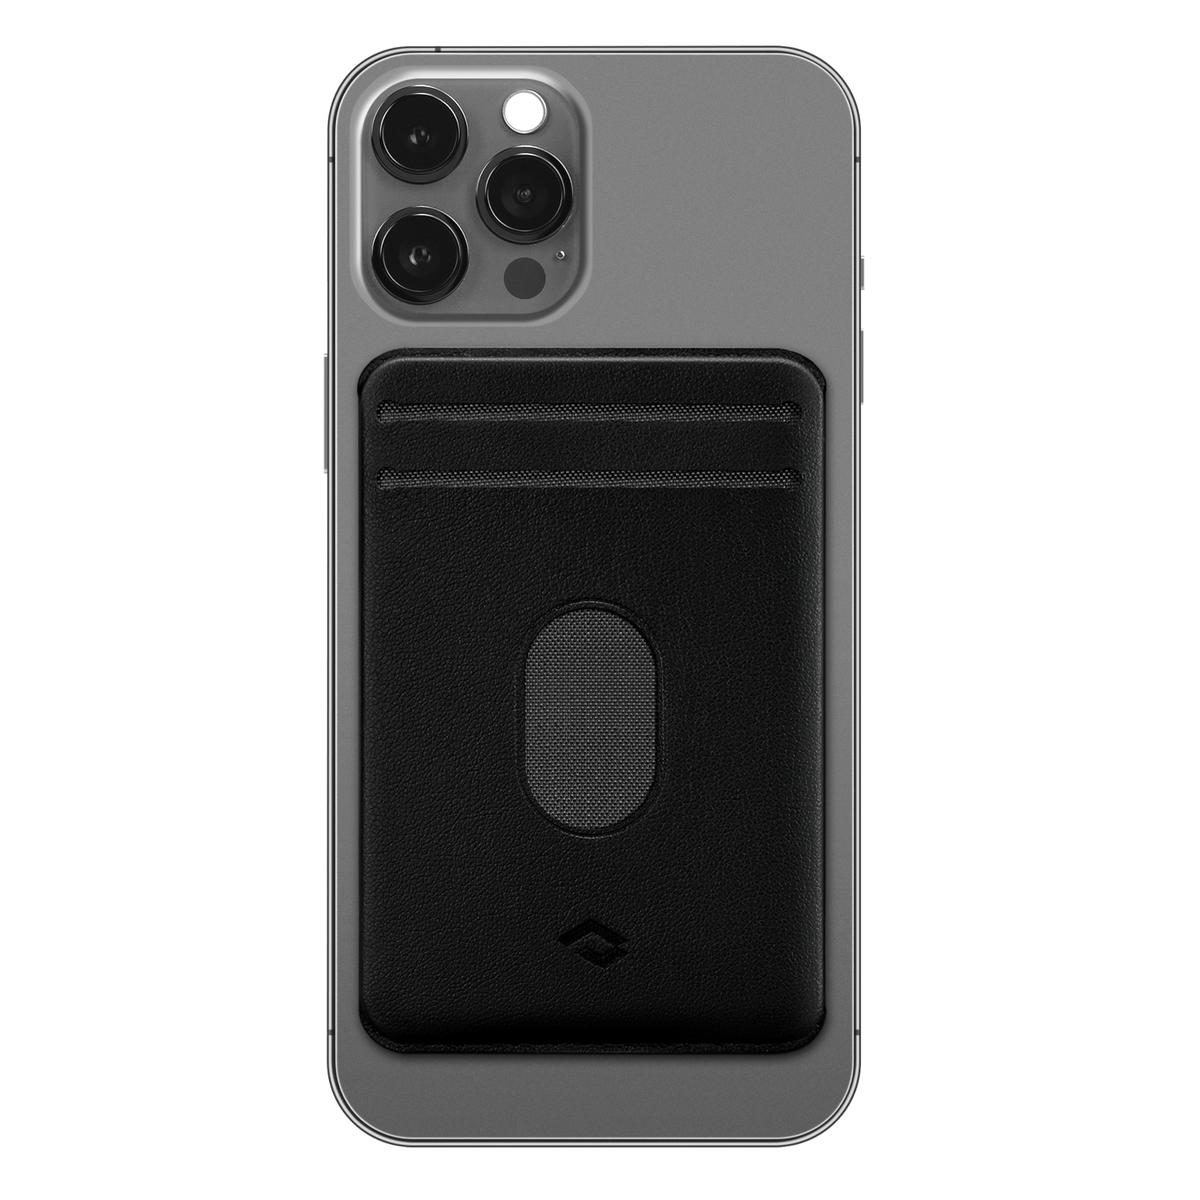 PITAKA 正規品 送料無料 公式 MagSafe対応 カードケース MagEZ 正規取扱店 Card Sleeve 2 PU素材 Case対応 磁気カード対応 iPhone マグネット式 カードホルダー 12シリーズ対応 背面 名刺収納 日本メーカー新品